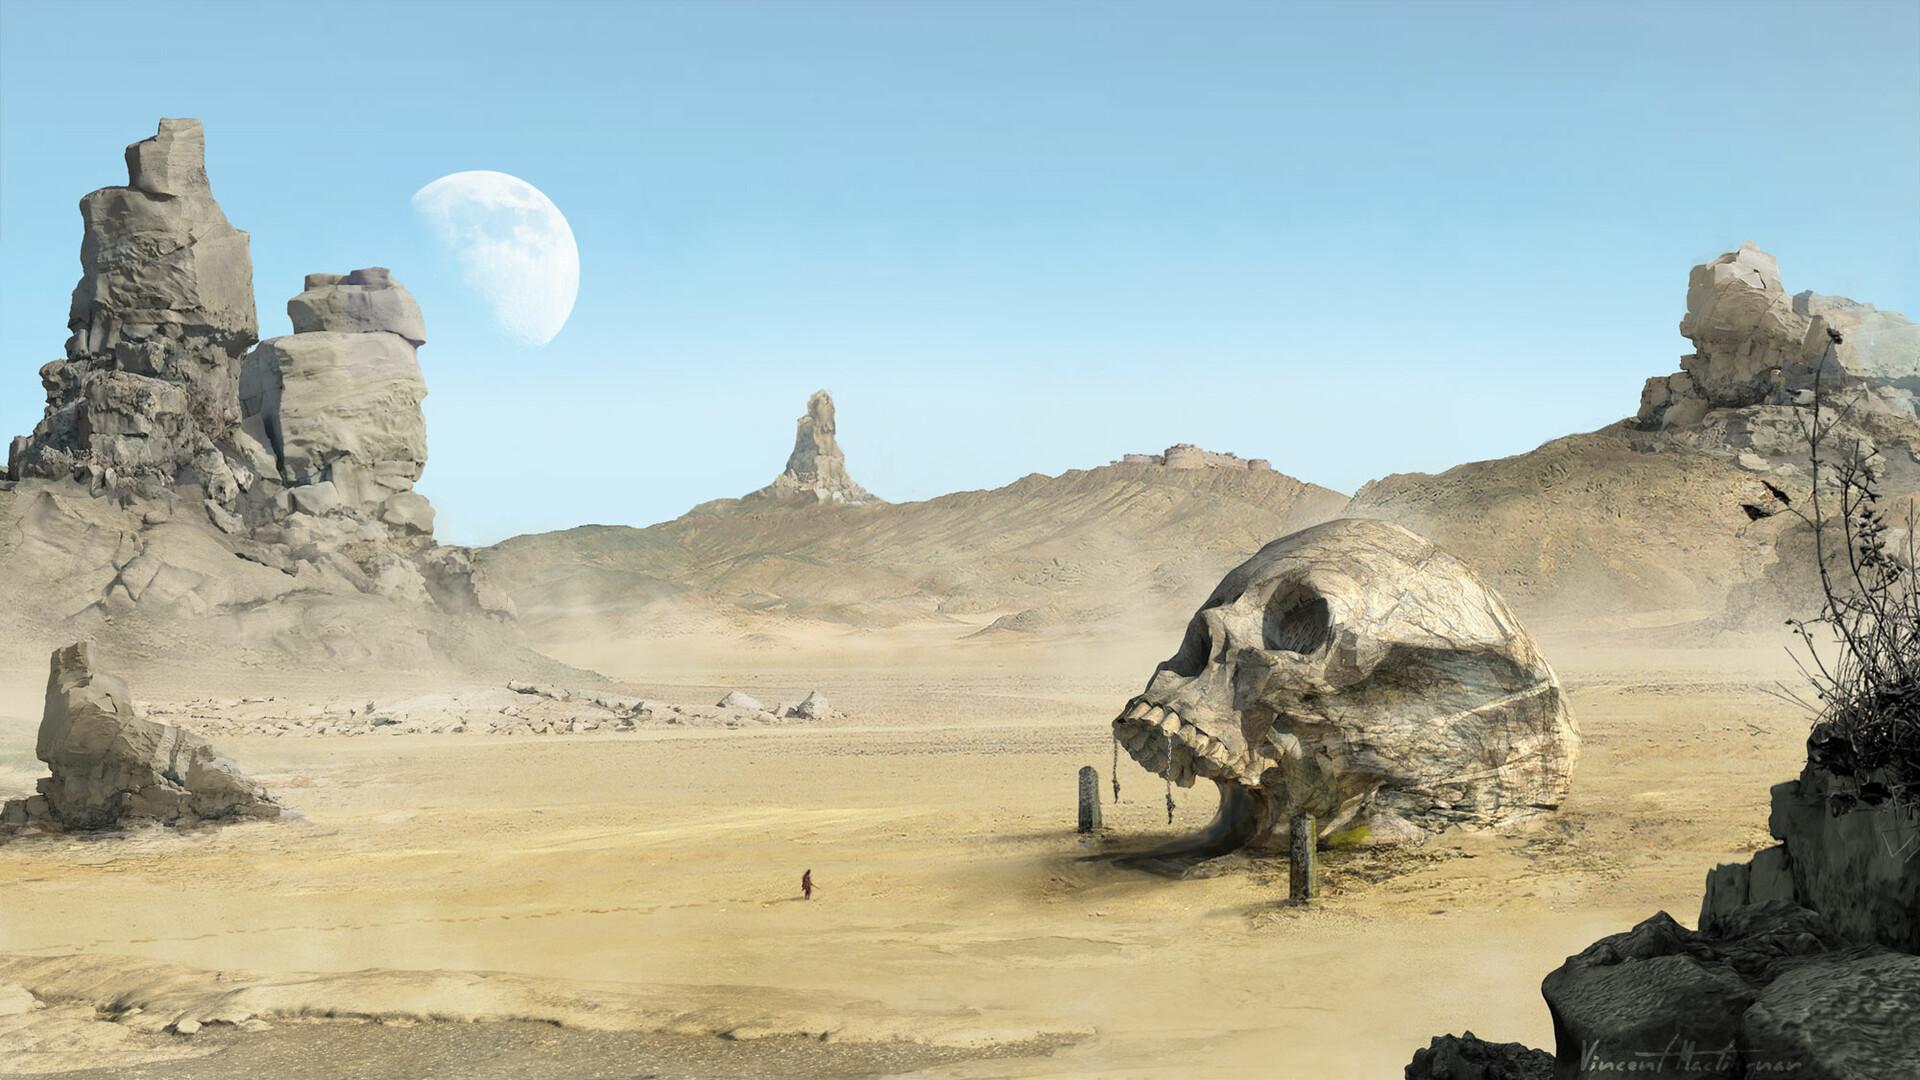 Vincent mactiernan desert skull v5 final 2k